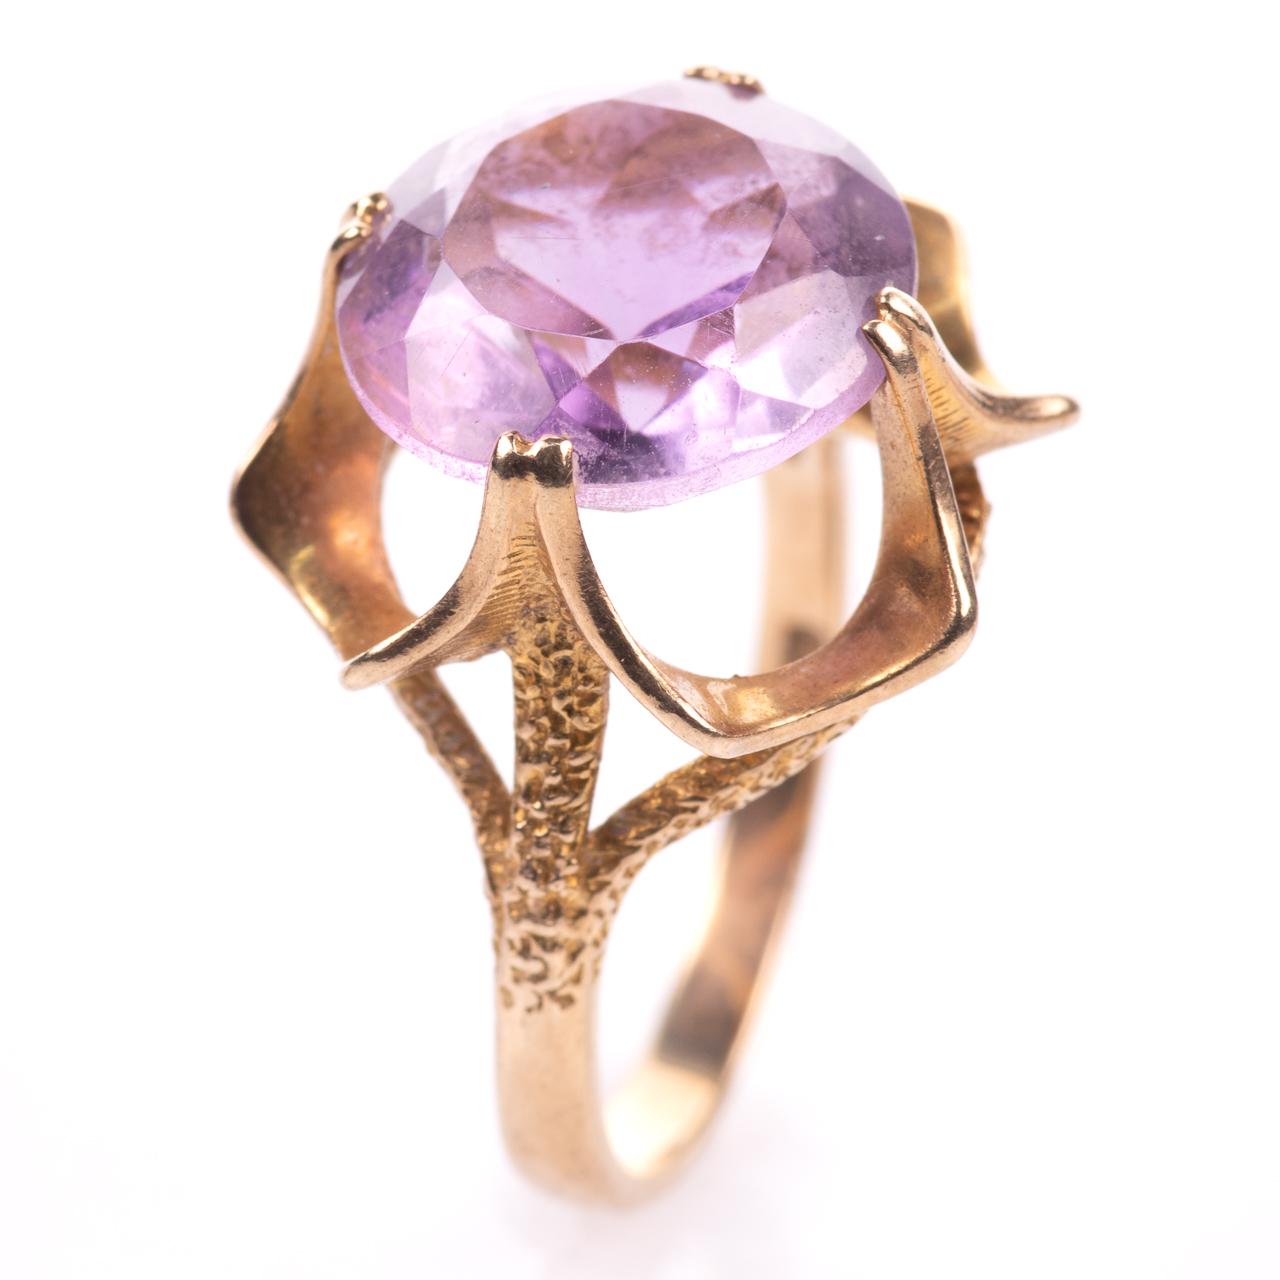 9ct Gold 6.45ct Amethyst Ring London 1974